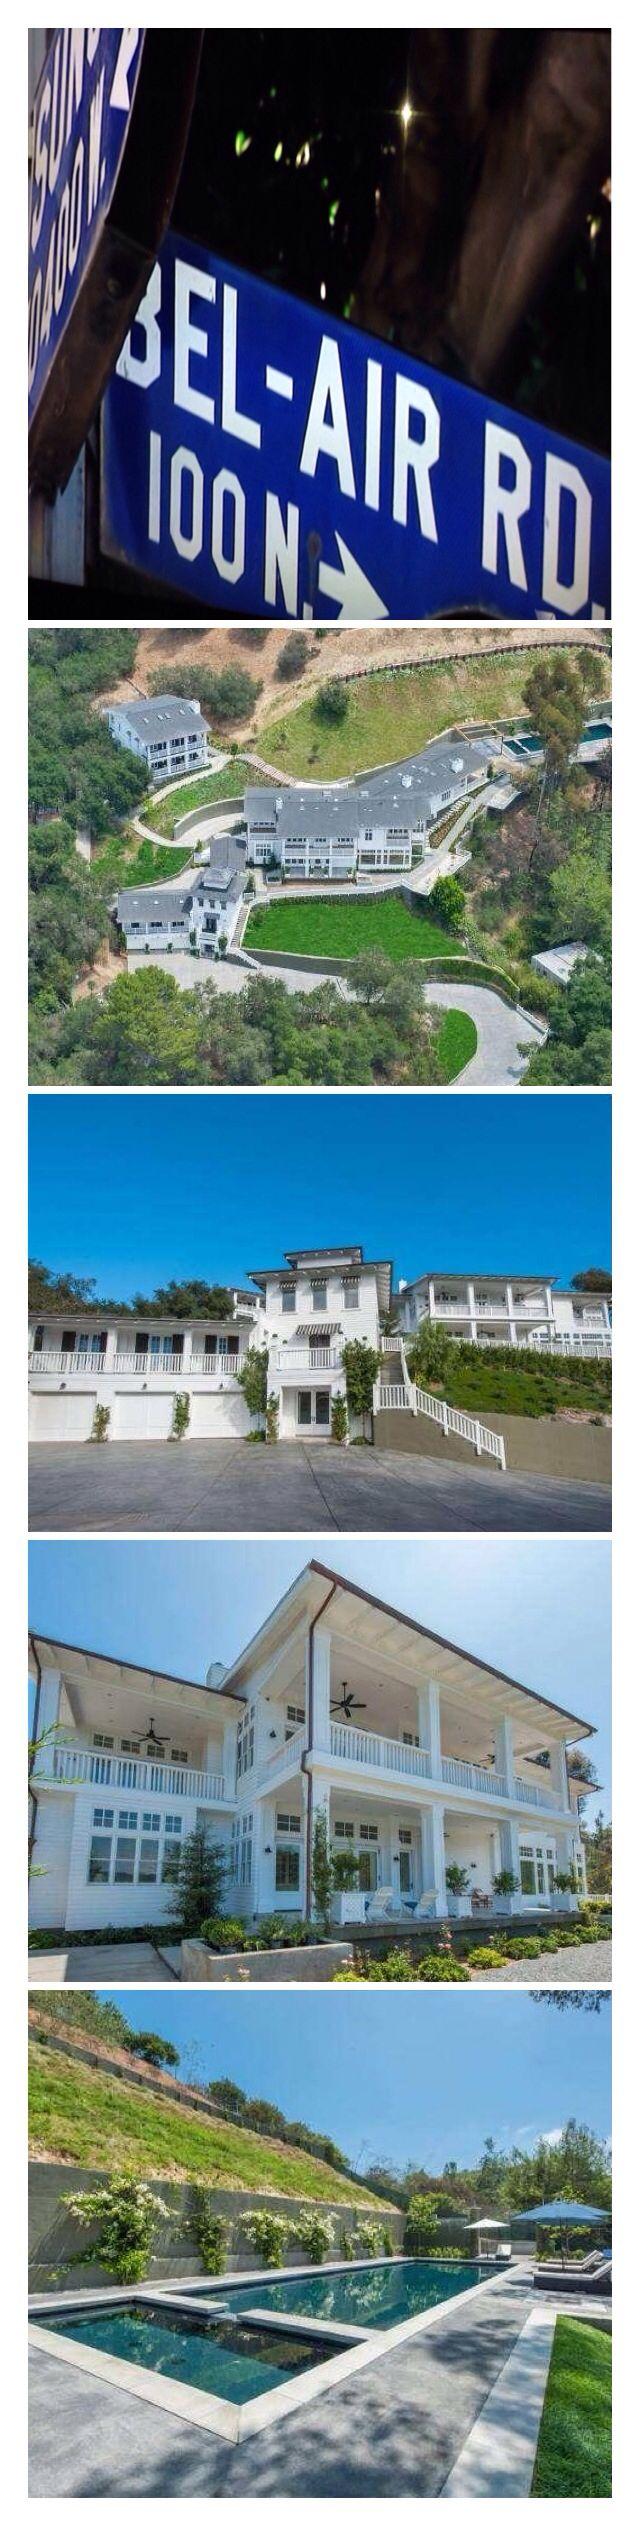 Luxury Homes Estates Bel Air Luxury Mansions Great Estates